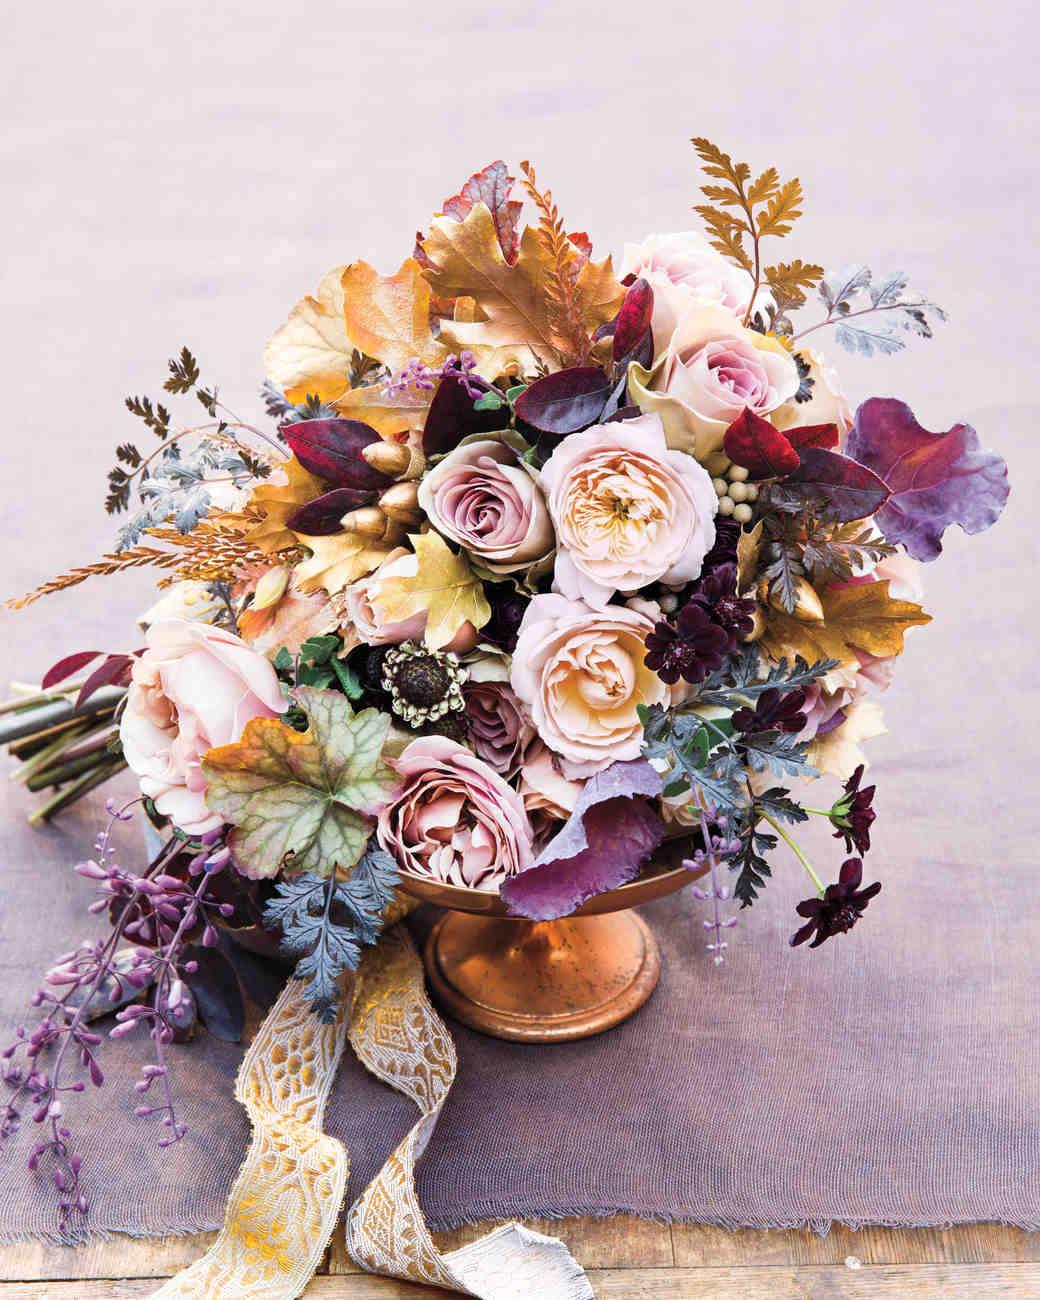 fall wedding favors fall wedding favors Candy Wedding Favor Ideas